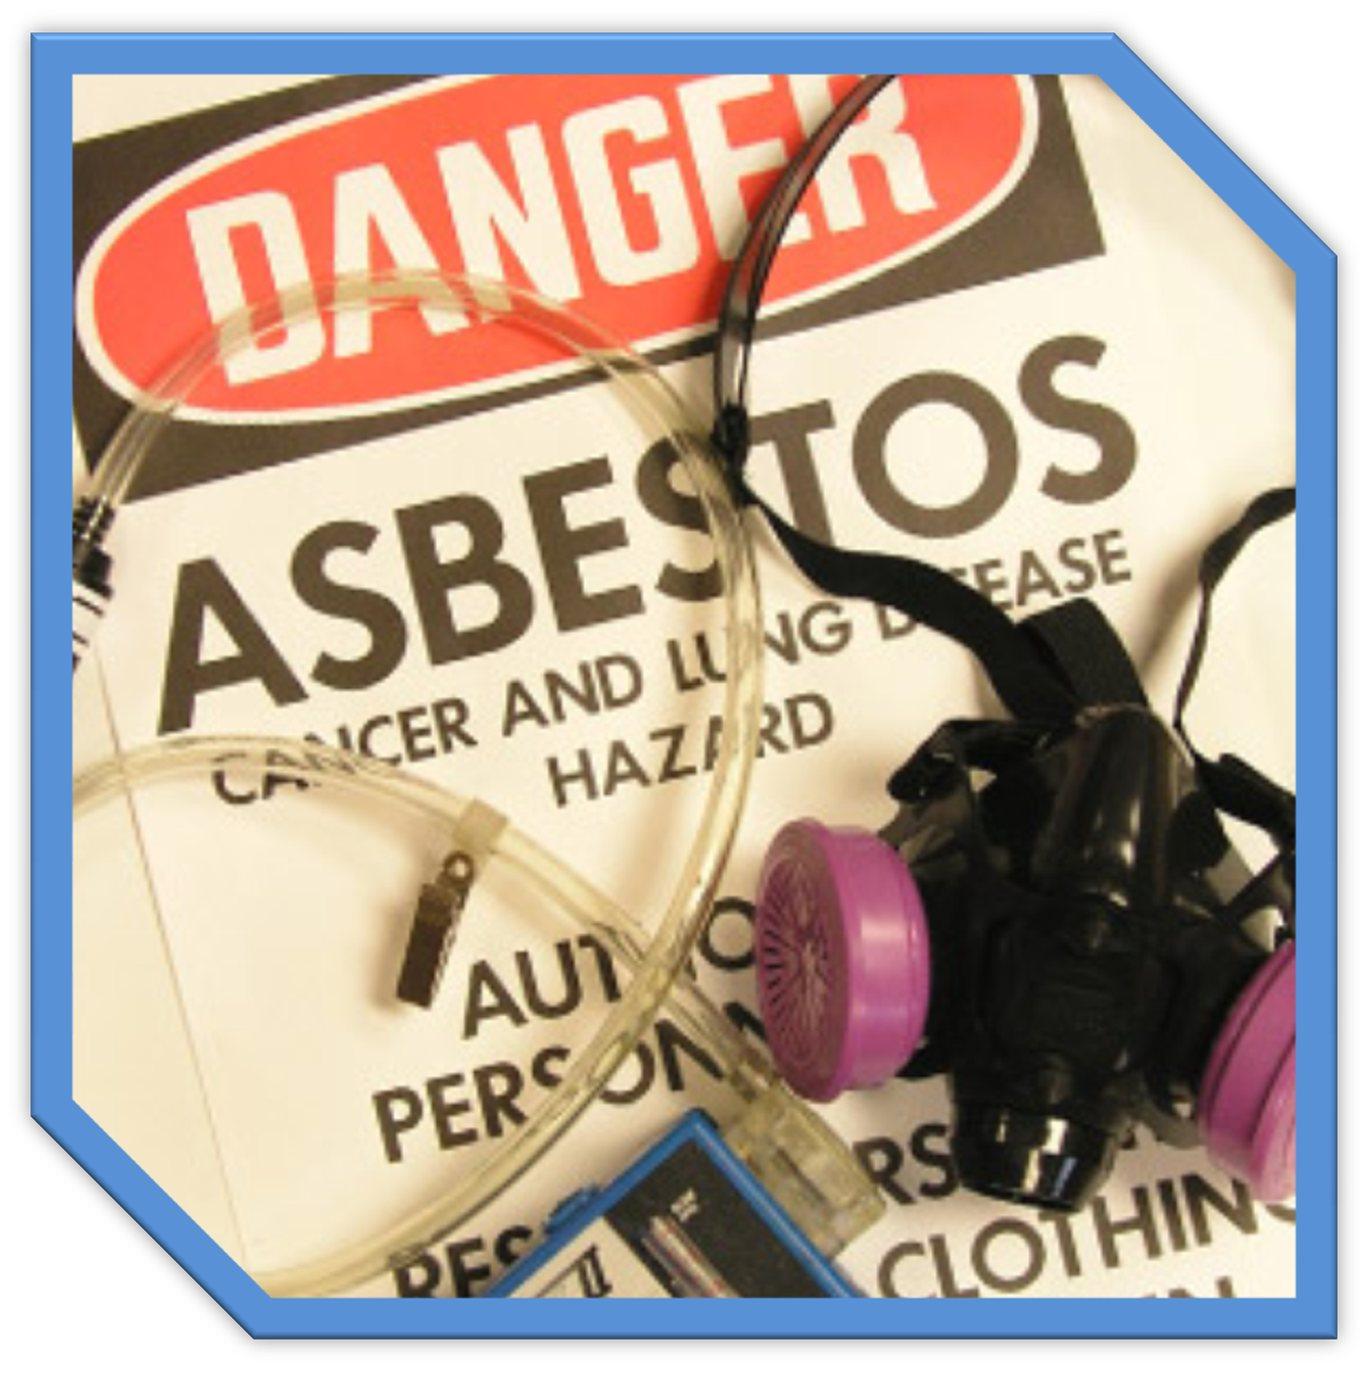 IAQ Solutions Asbestos